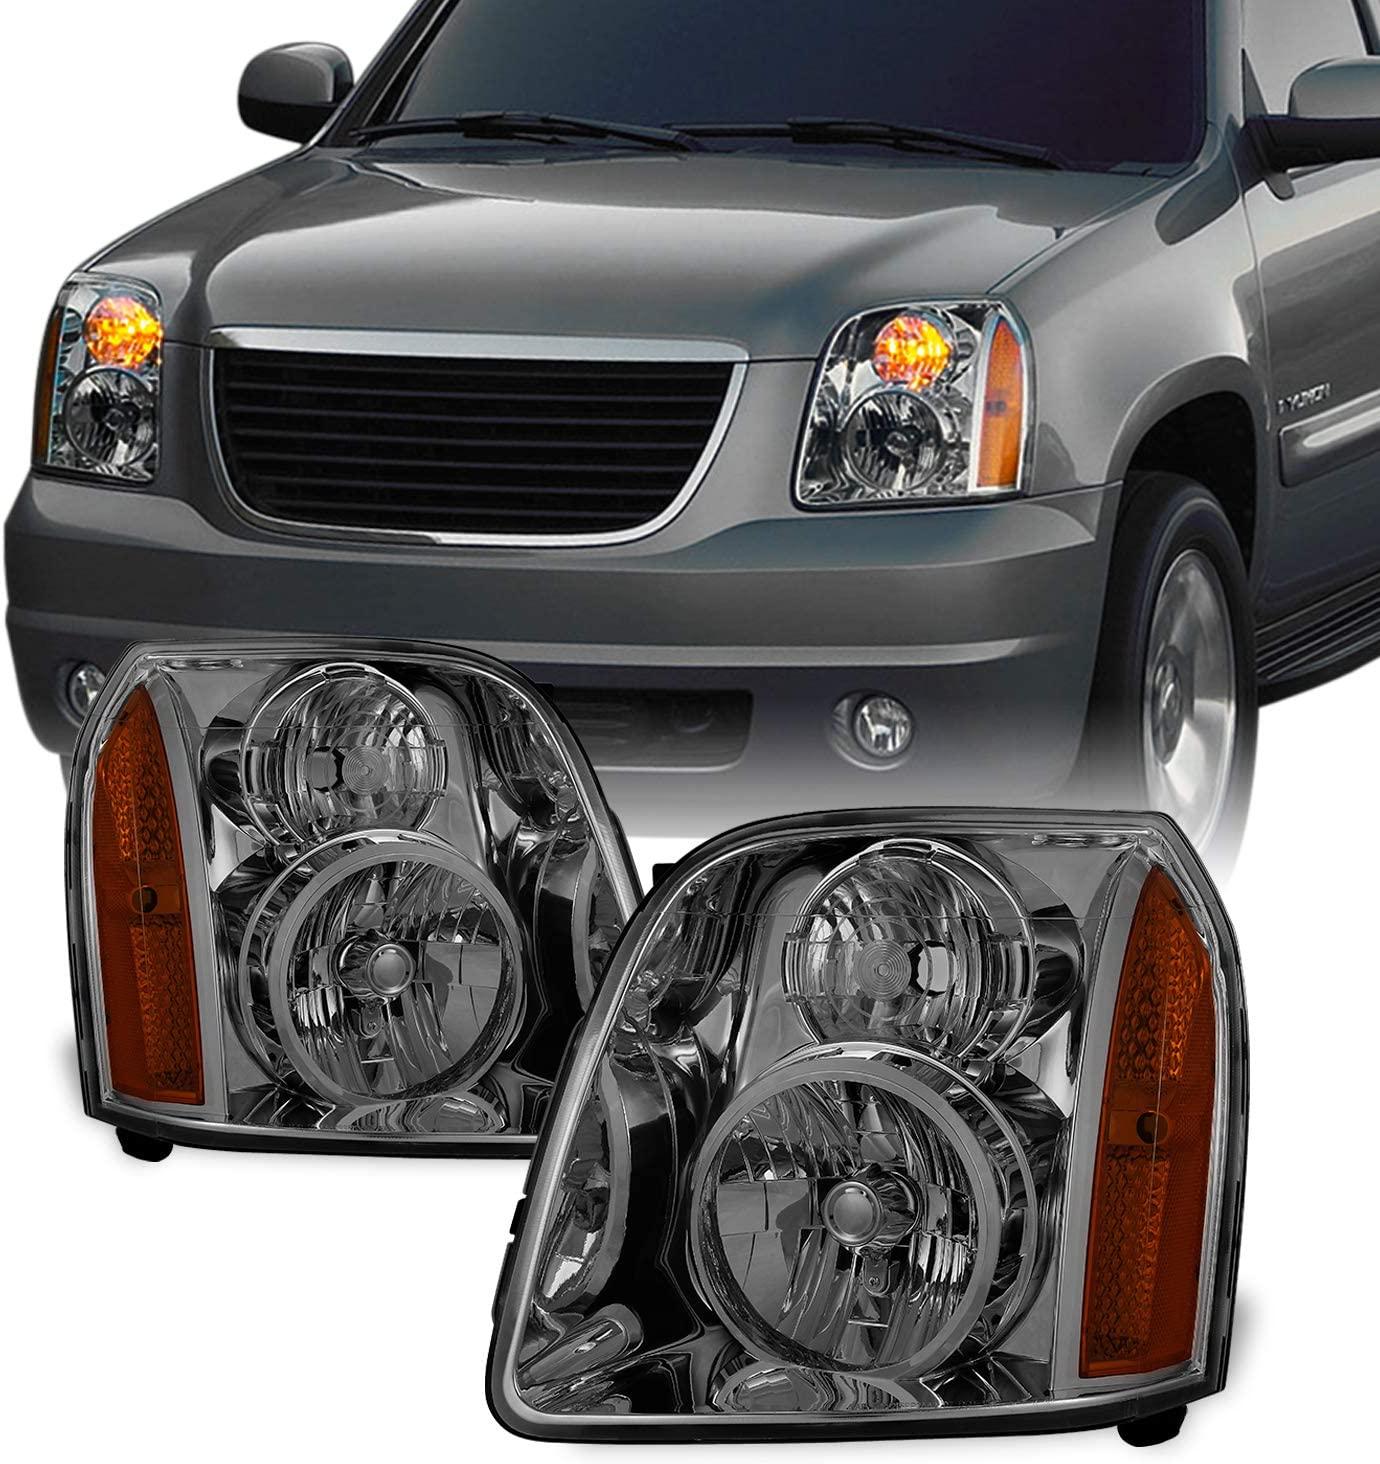 For GMC Yukon XL Hybrid OE Replacement Smoke Bezel Headlights Driver/Passenger Head Lamps Pair